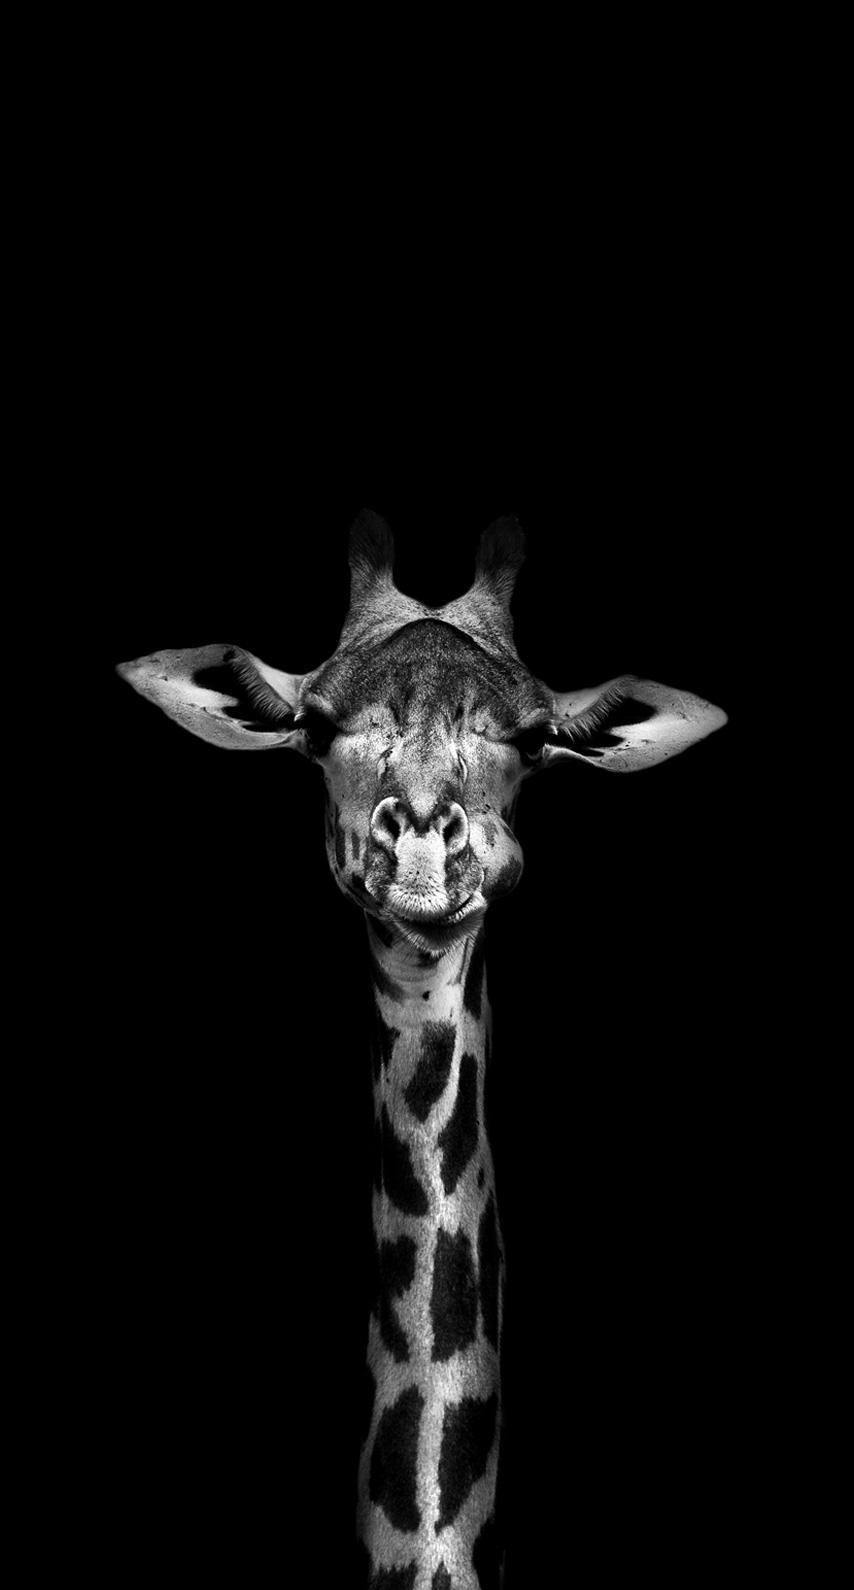 mammal, black and white